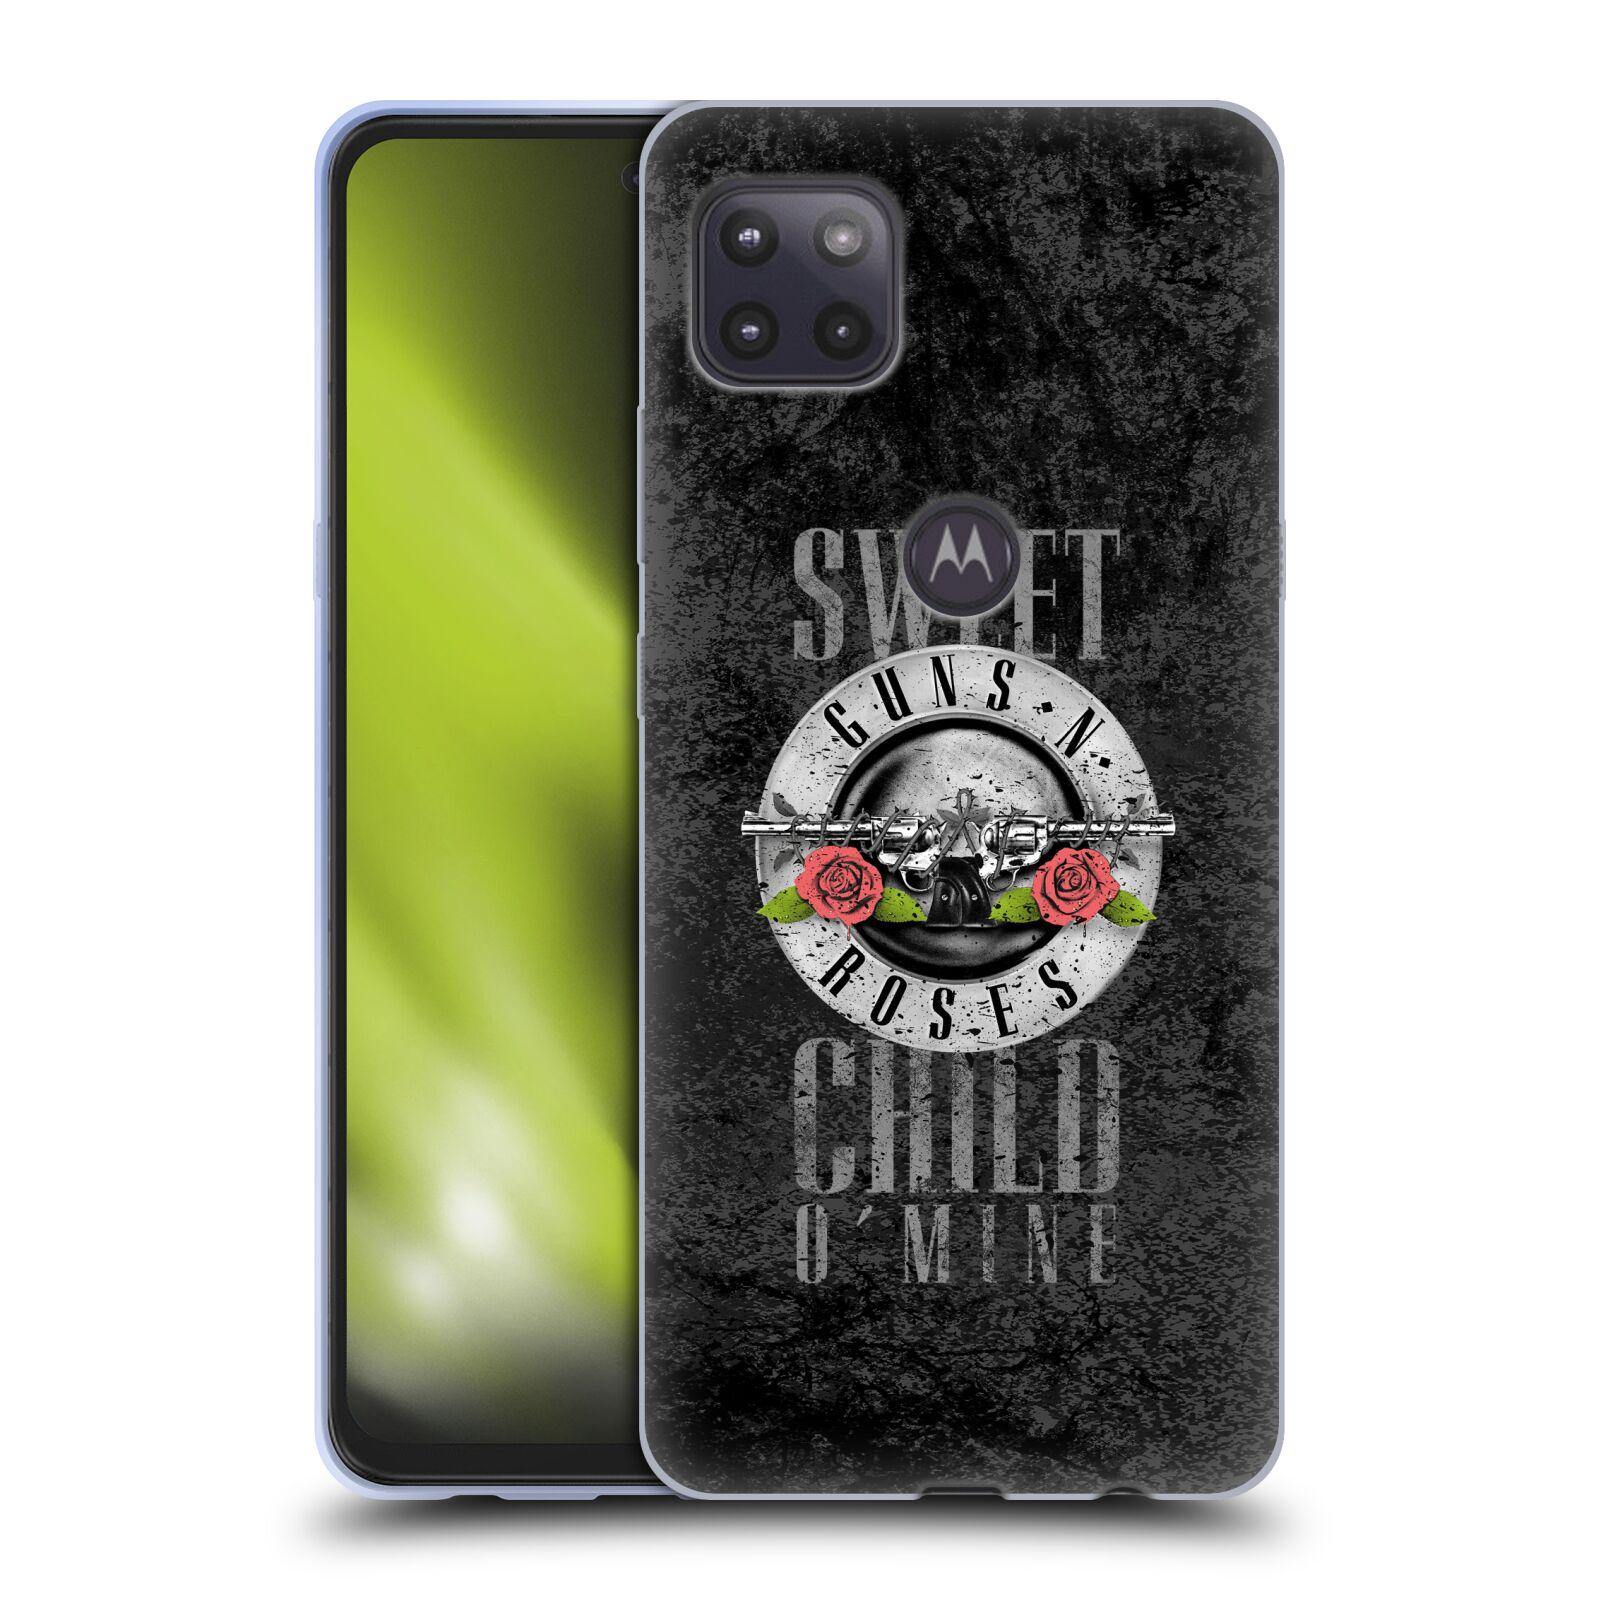 Silikonové pouzdro na mobil Motorola Moto G 5G - Head Case - Guns N' Roses - Sweet Child